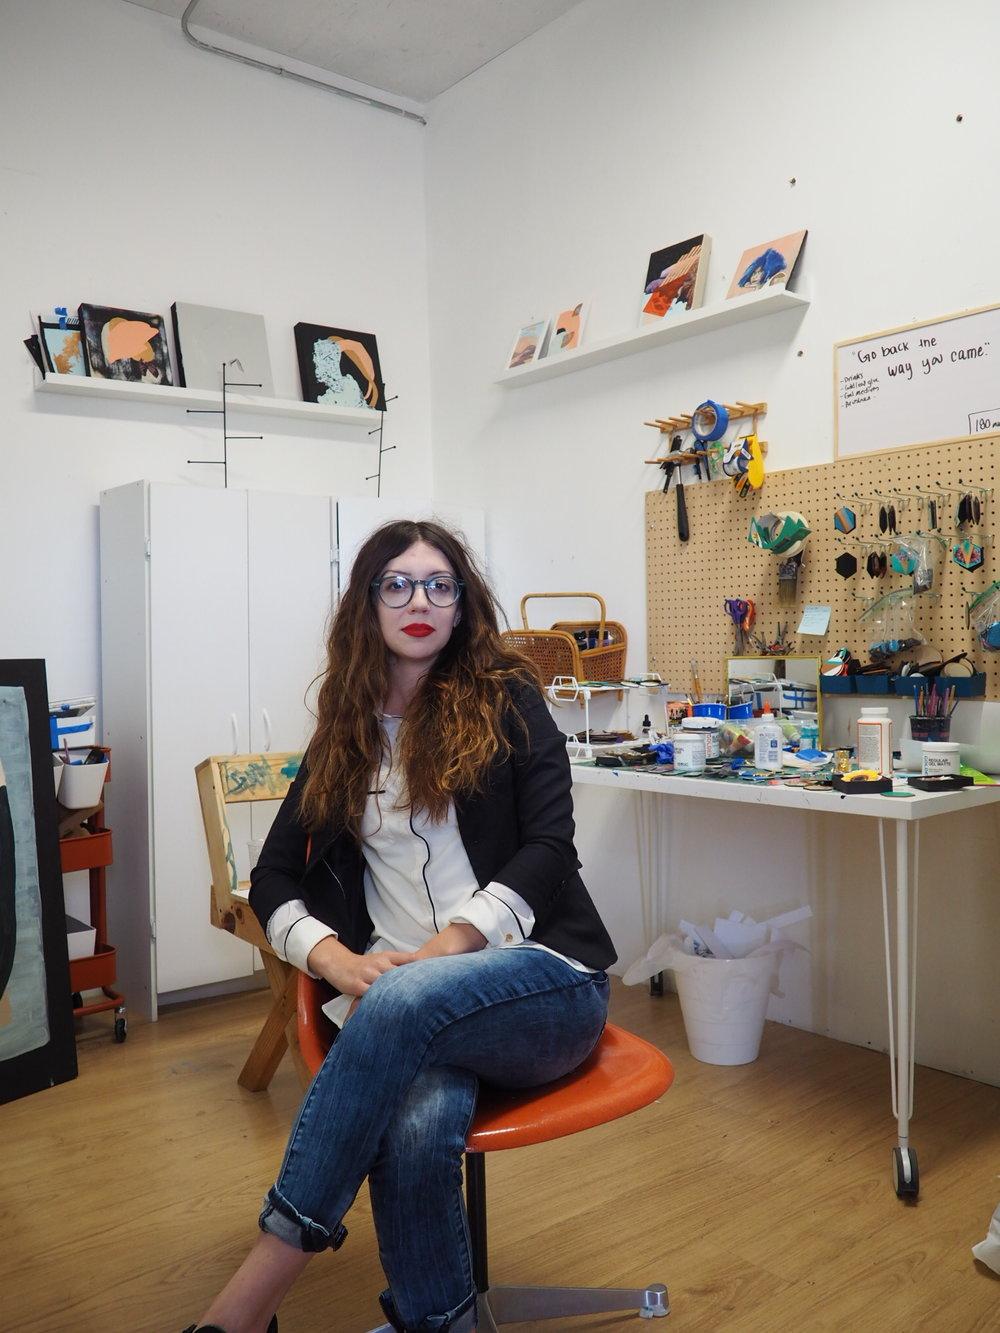 Catalina Bellizzi welcomes NTCH to her studio.